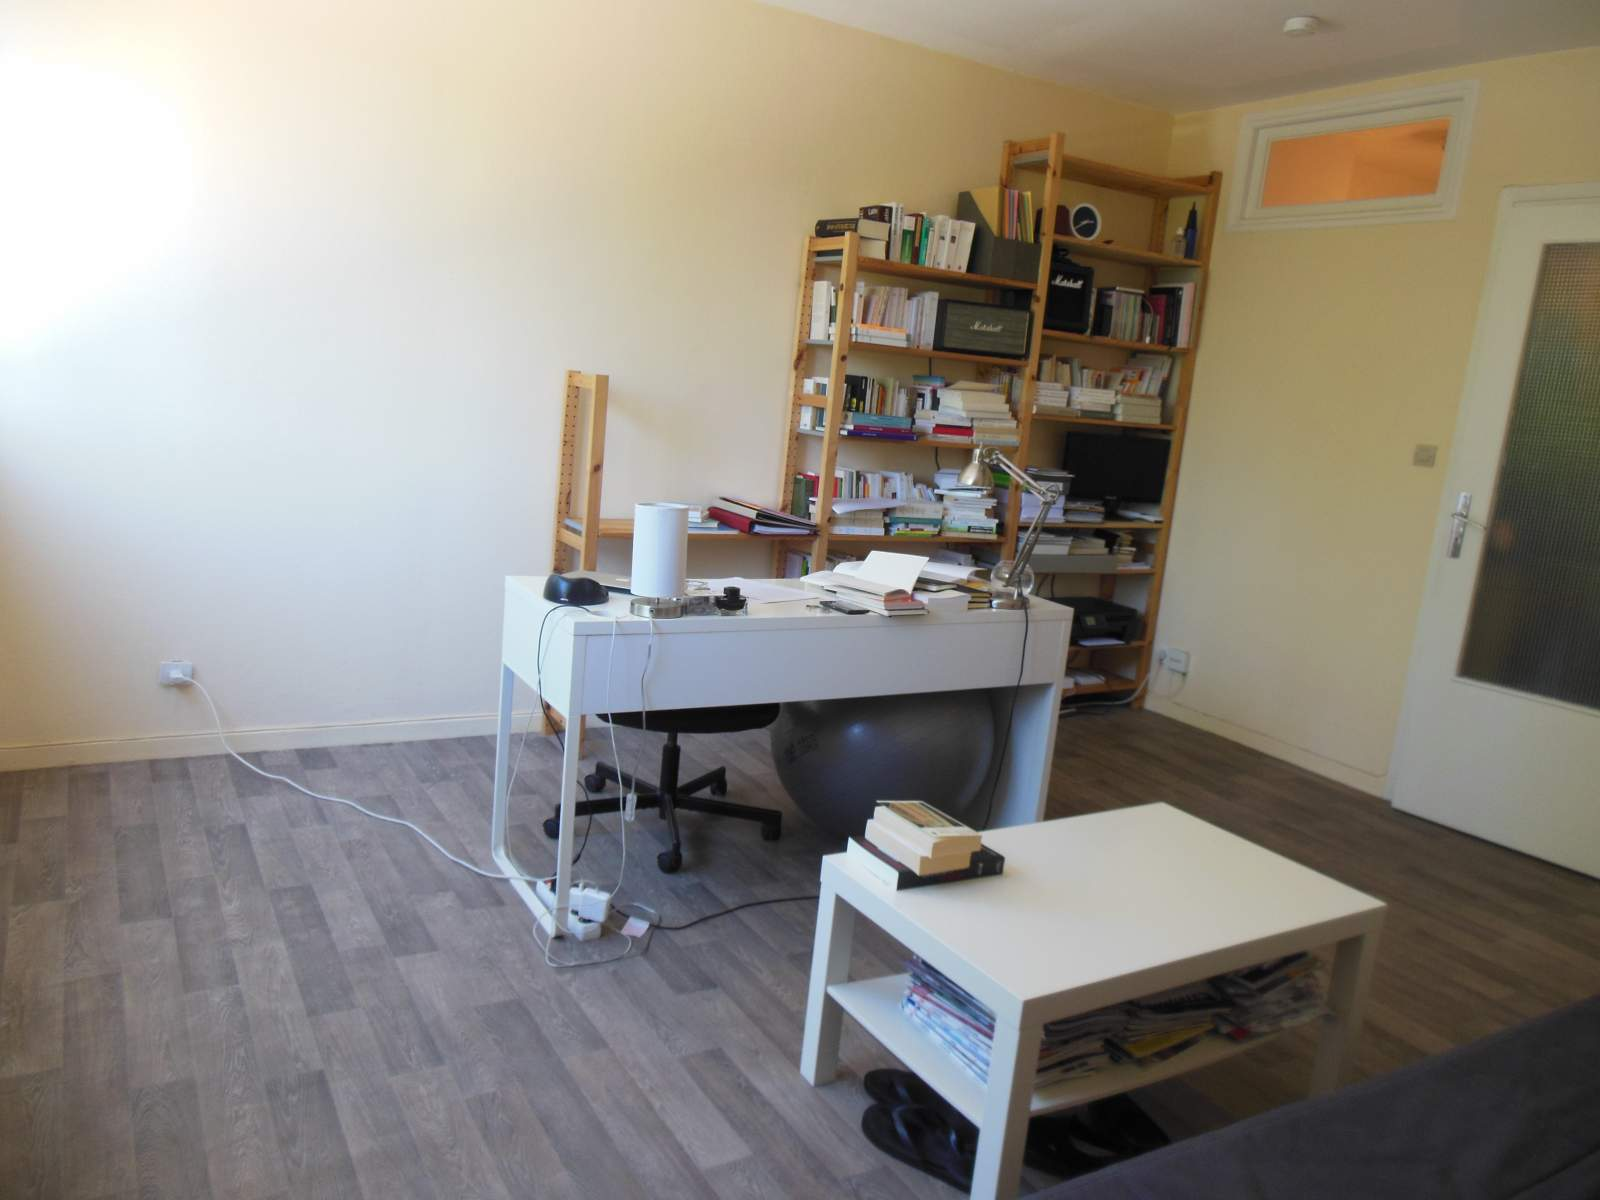 Achat appartement Toulouse : acheter selon ses moyens